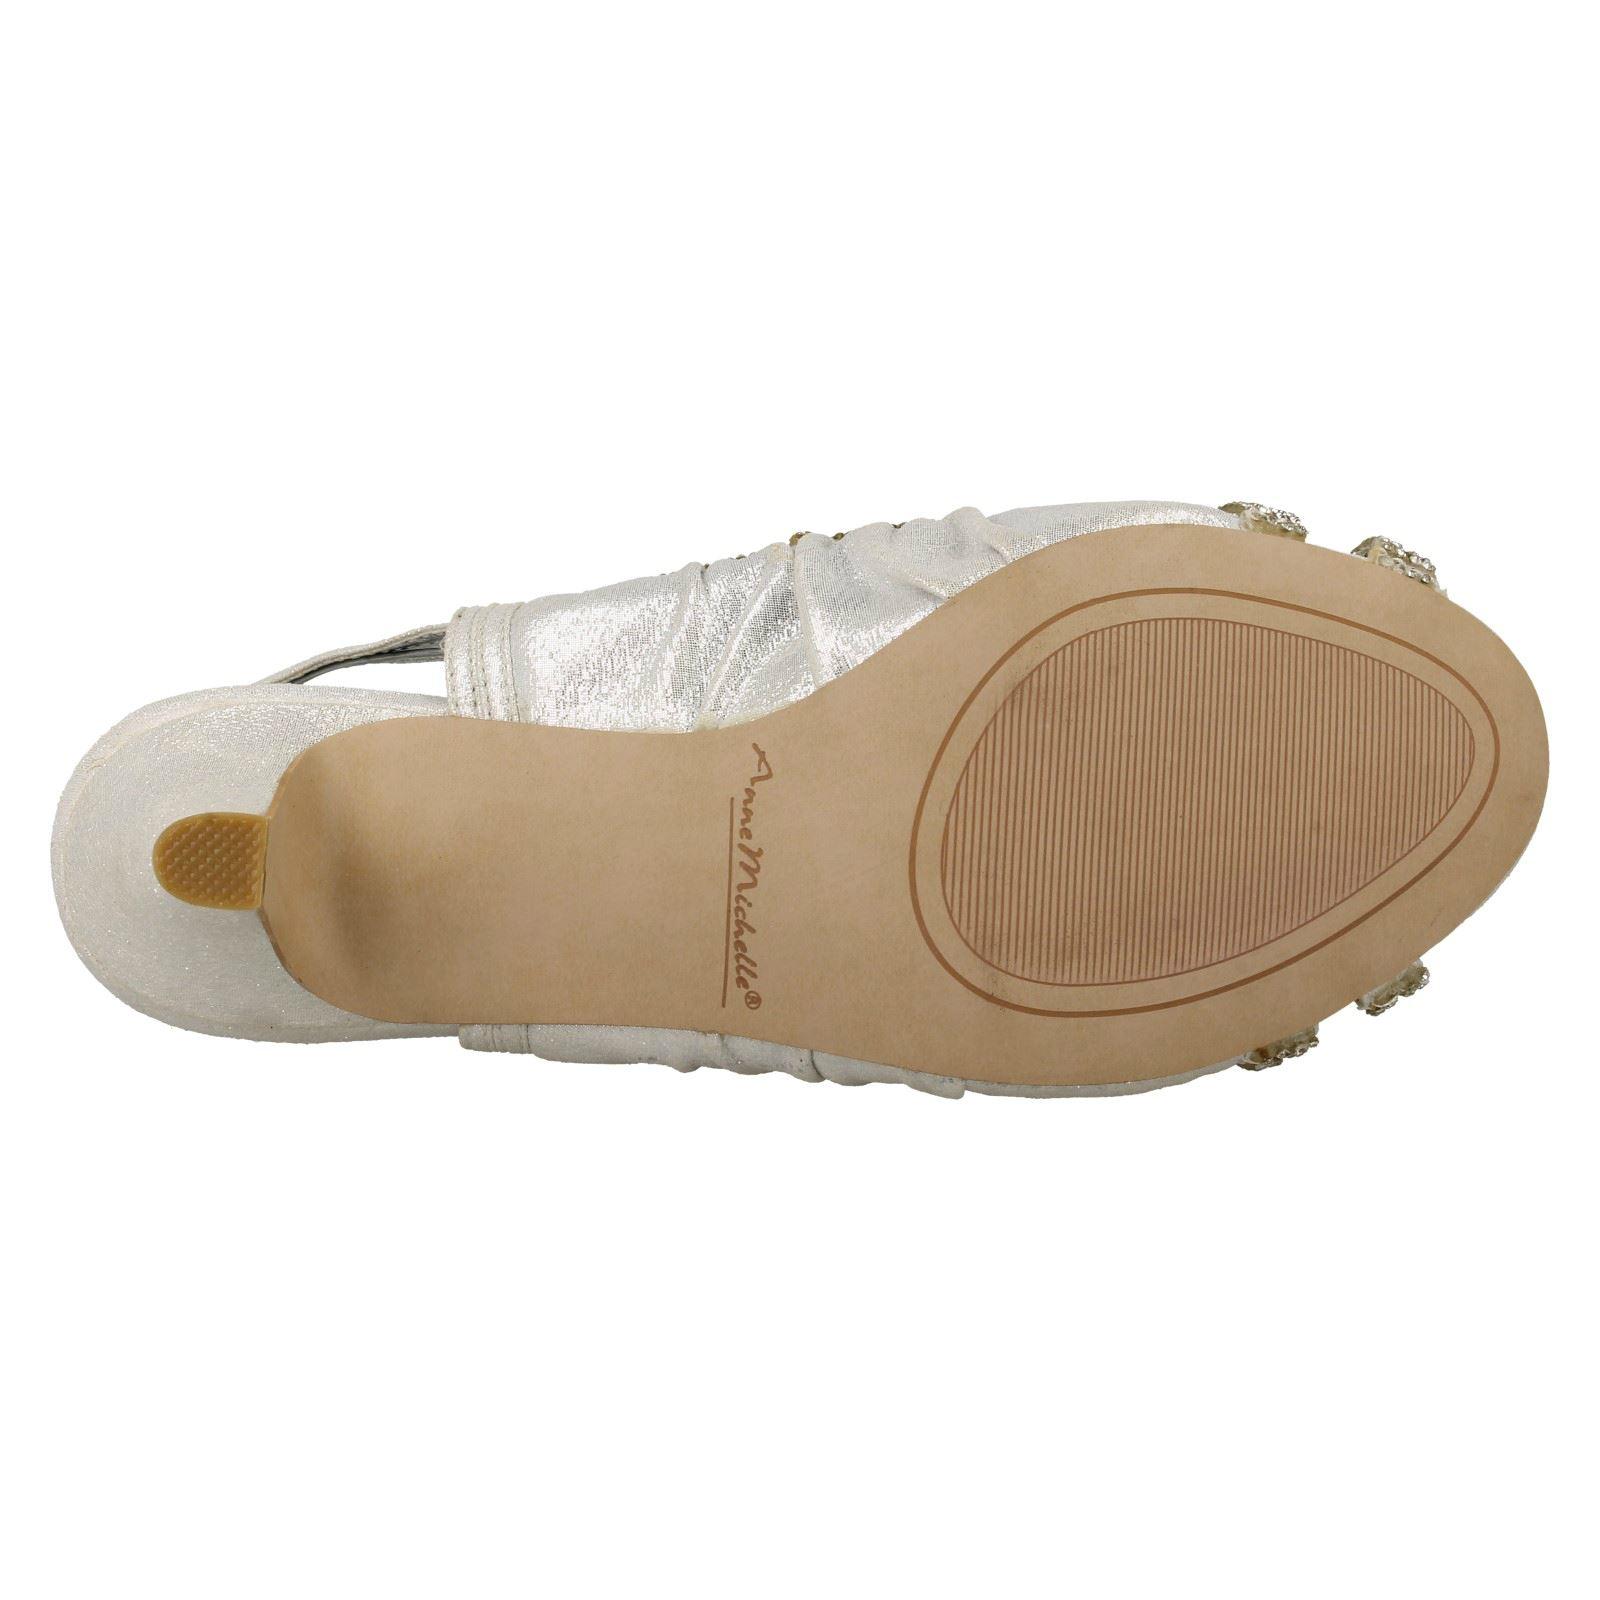 Ladies-Anne-Michelle-Sling-Back-Peep-Toe-Sandals